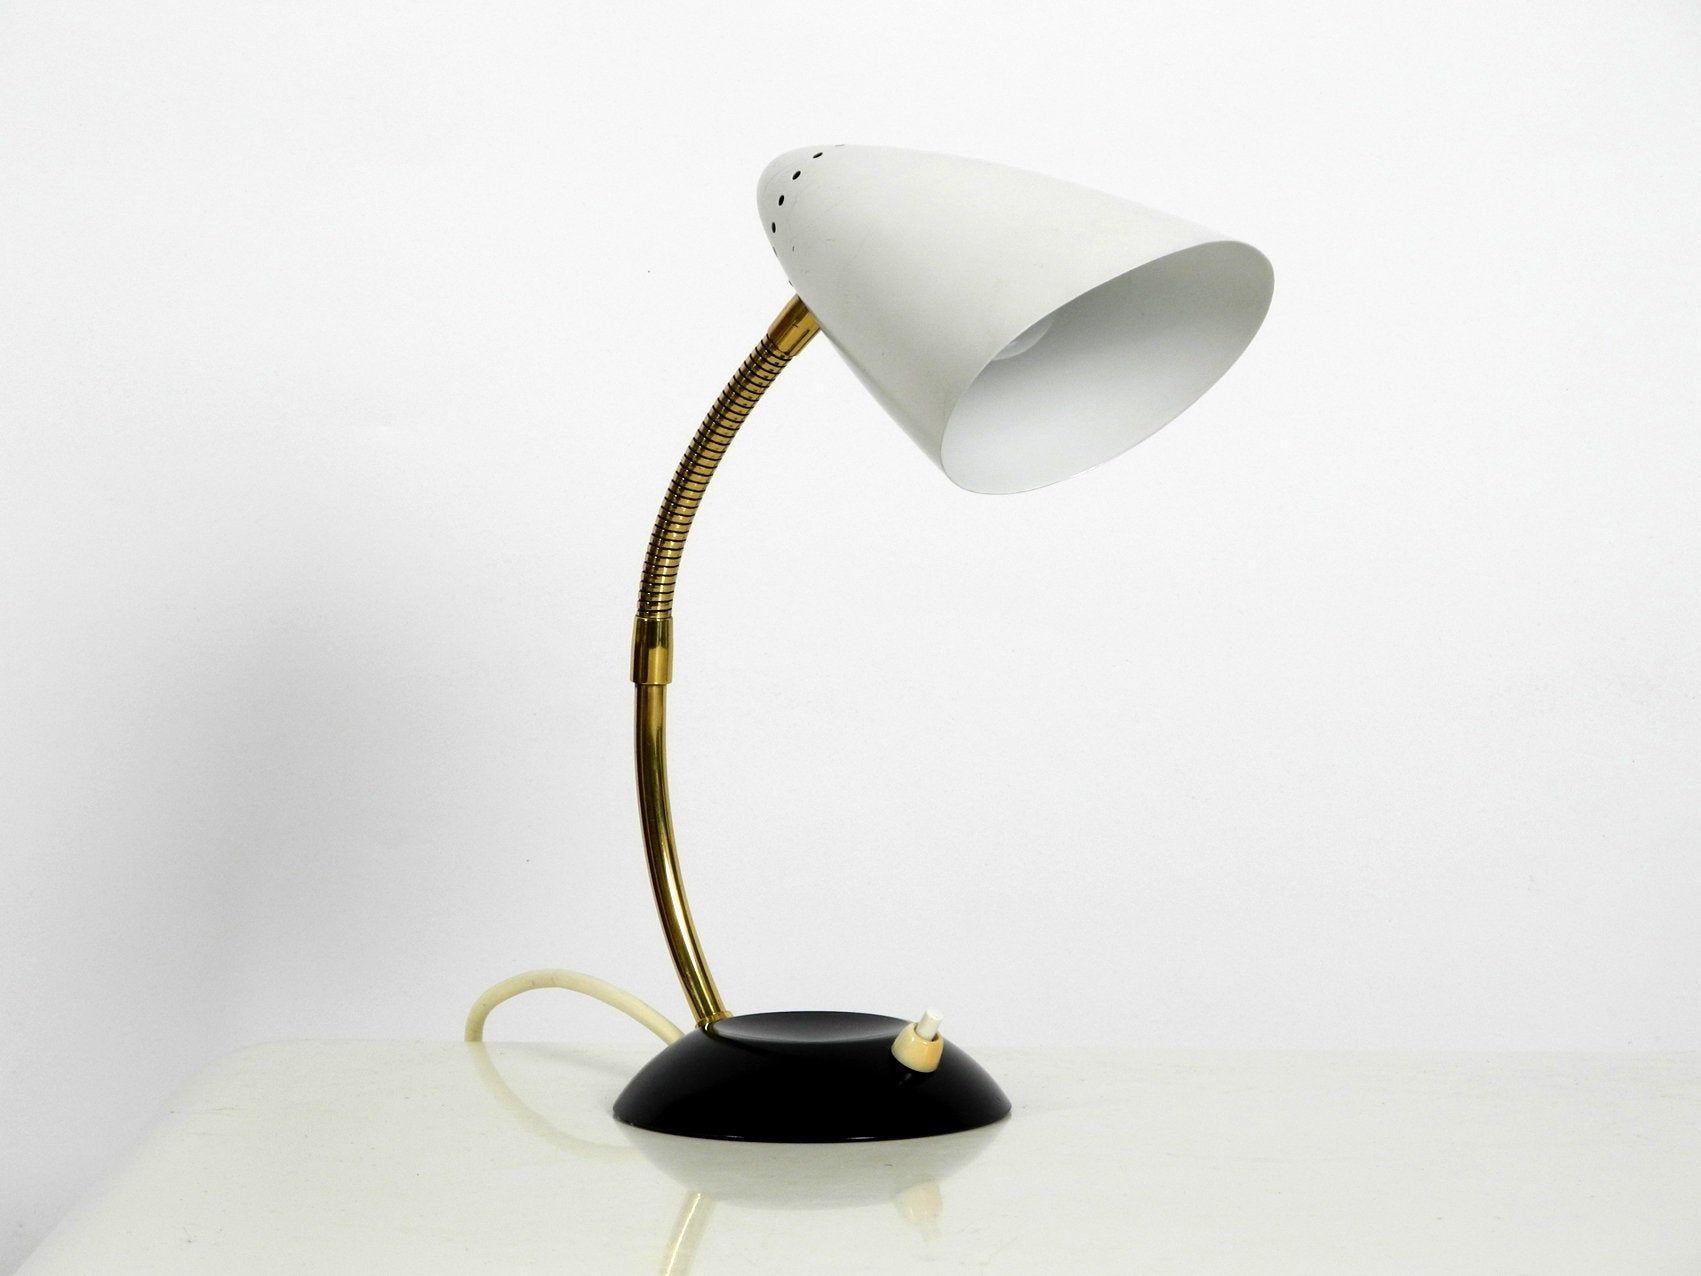 Classic Beautiful Mid Century Modern Table Lamp By Kaiser Leuchten